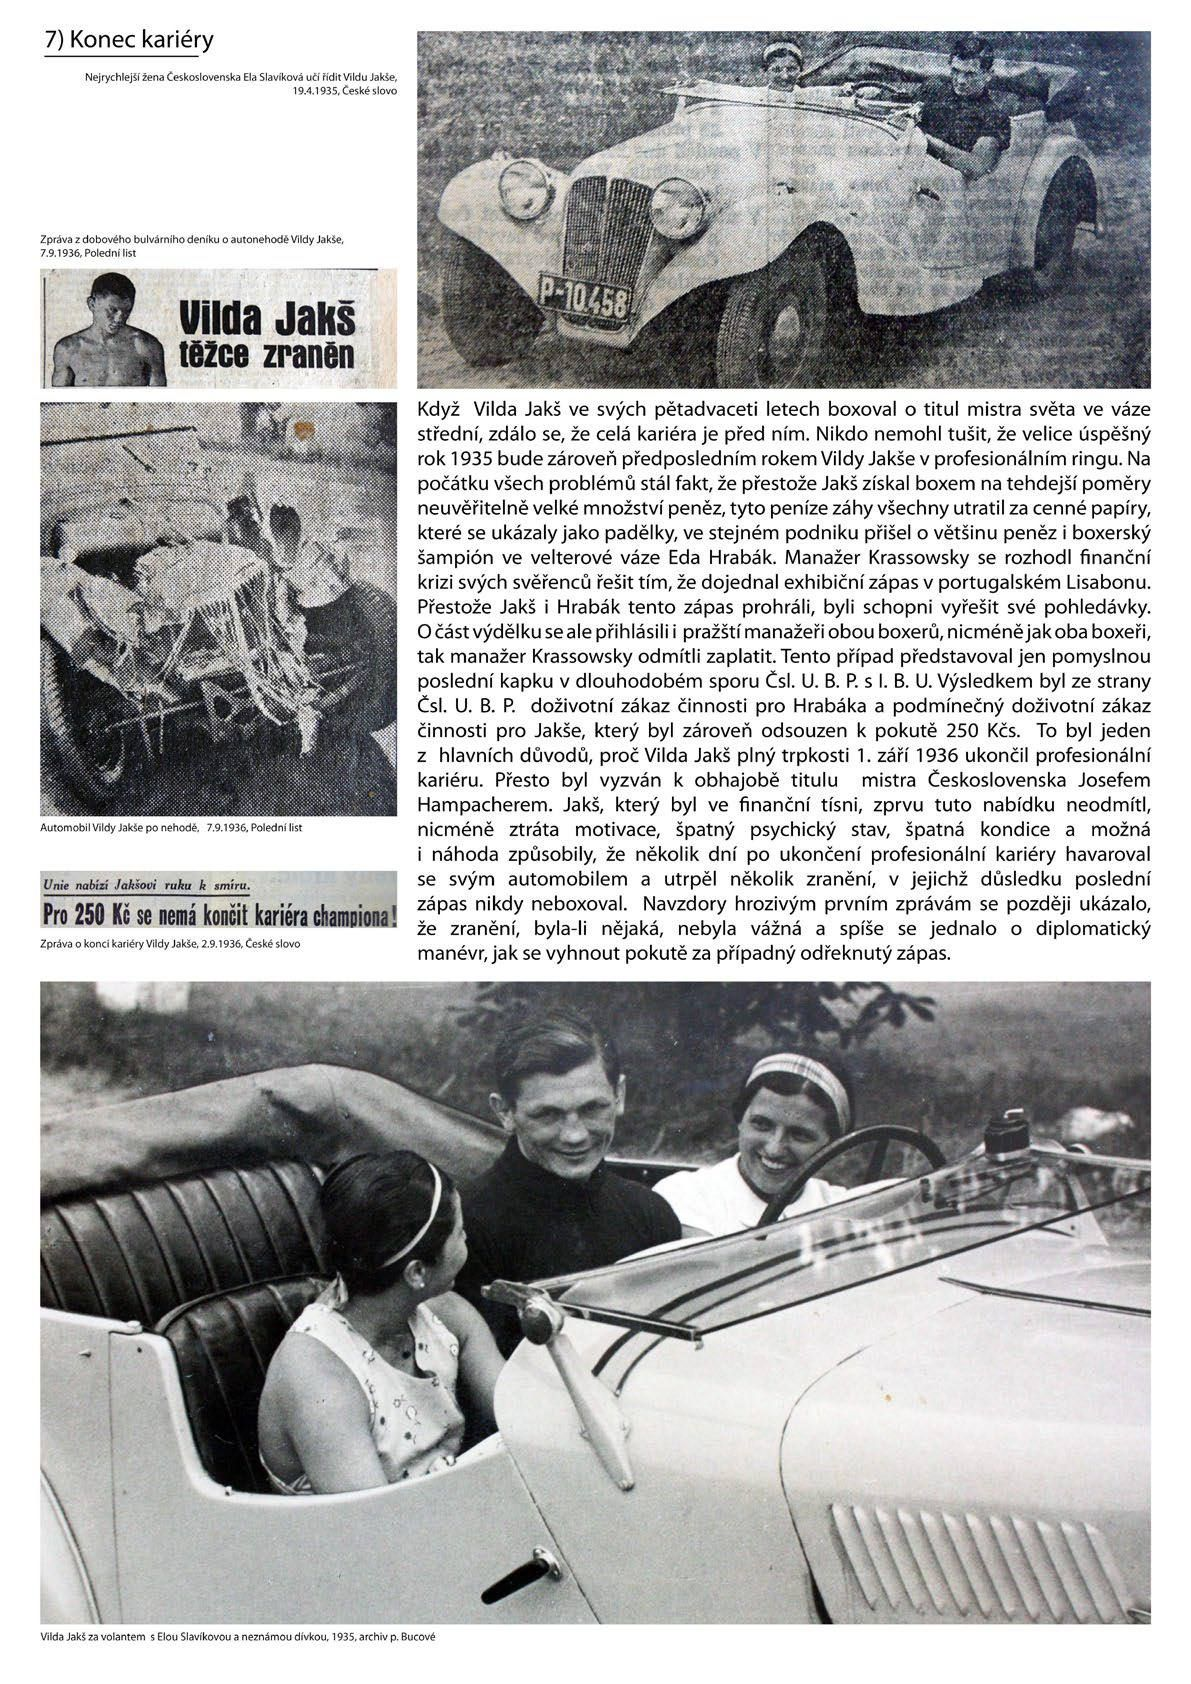 Vilda Jakš - konec kariéry